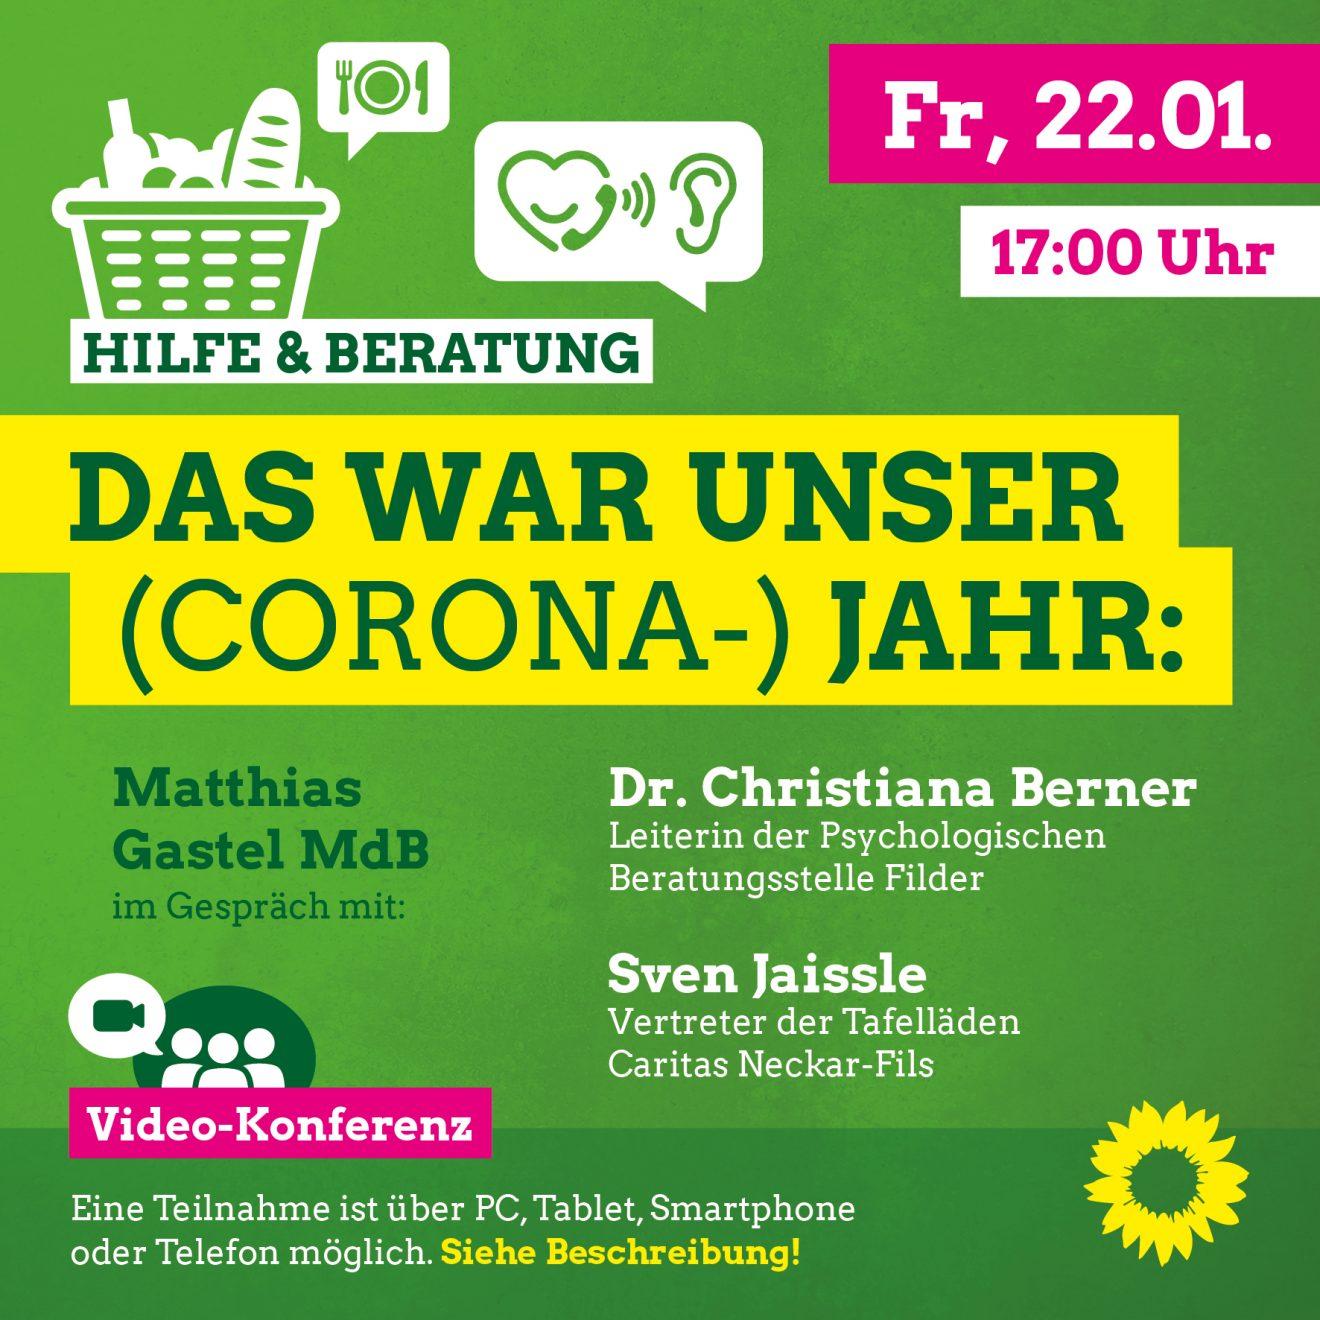 Sharepic Corona und Soziales 22.01.